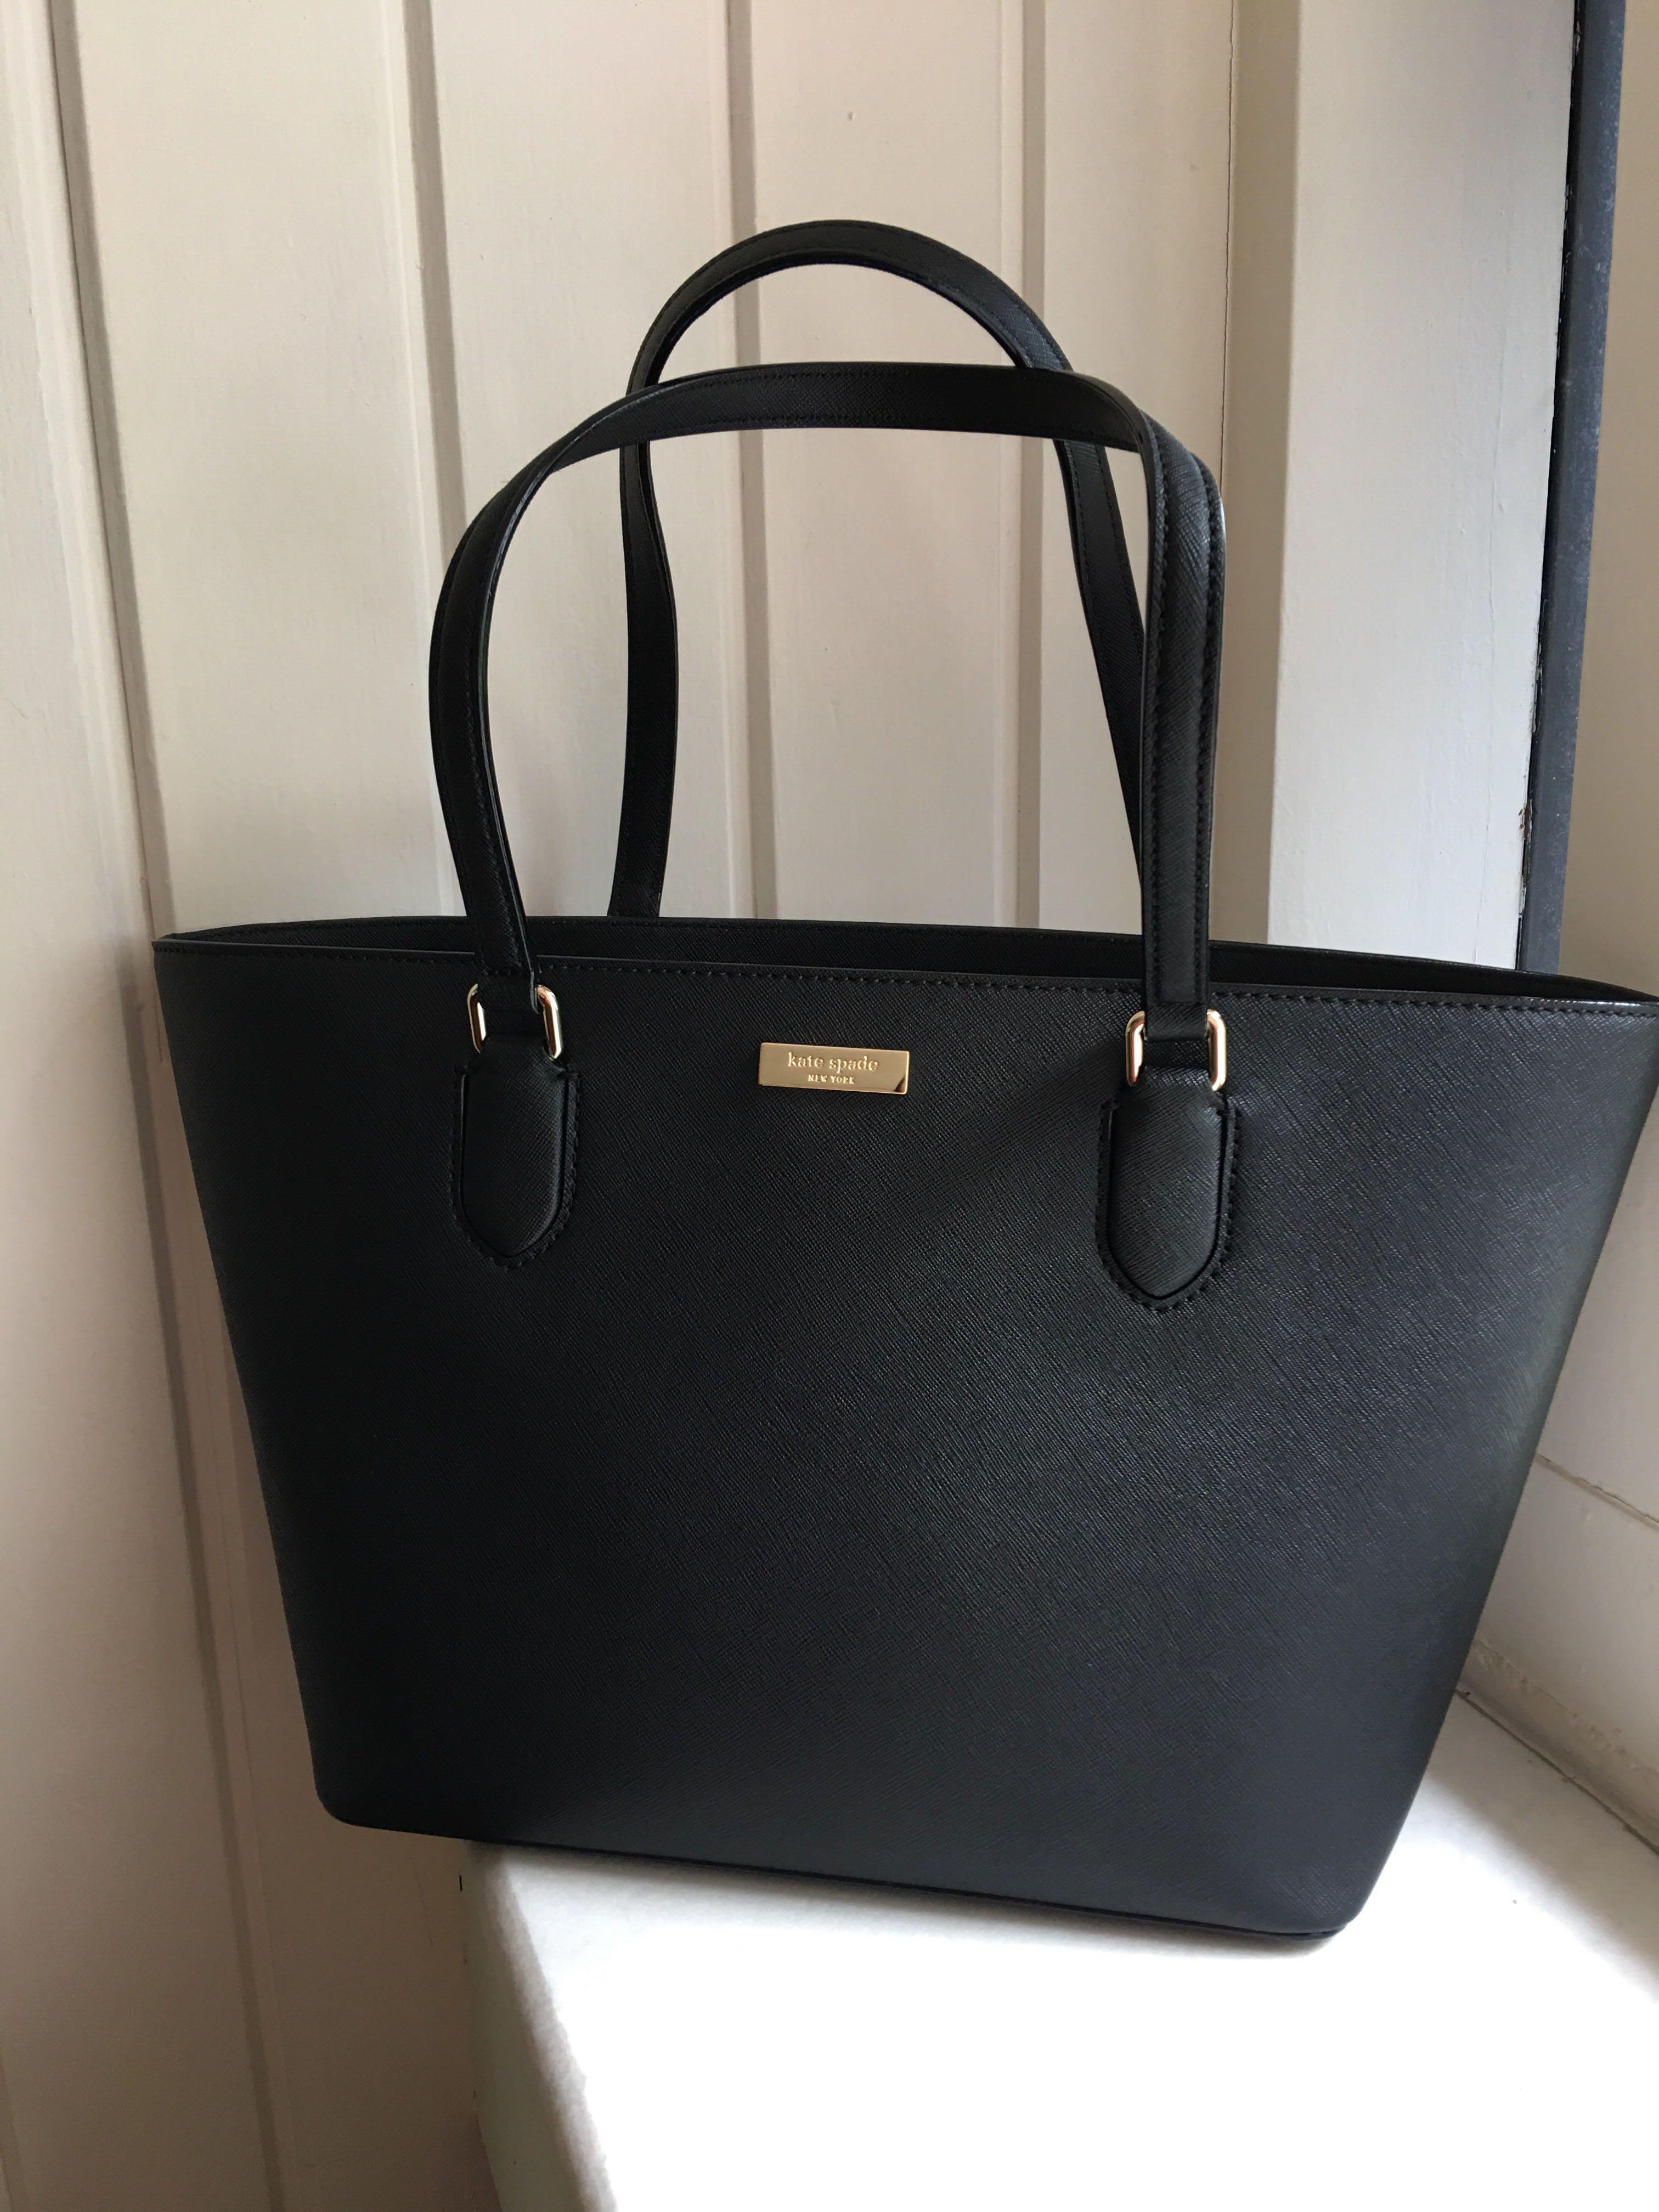 171f4b418c Authentic Kate Spade Leather Dally Handbag